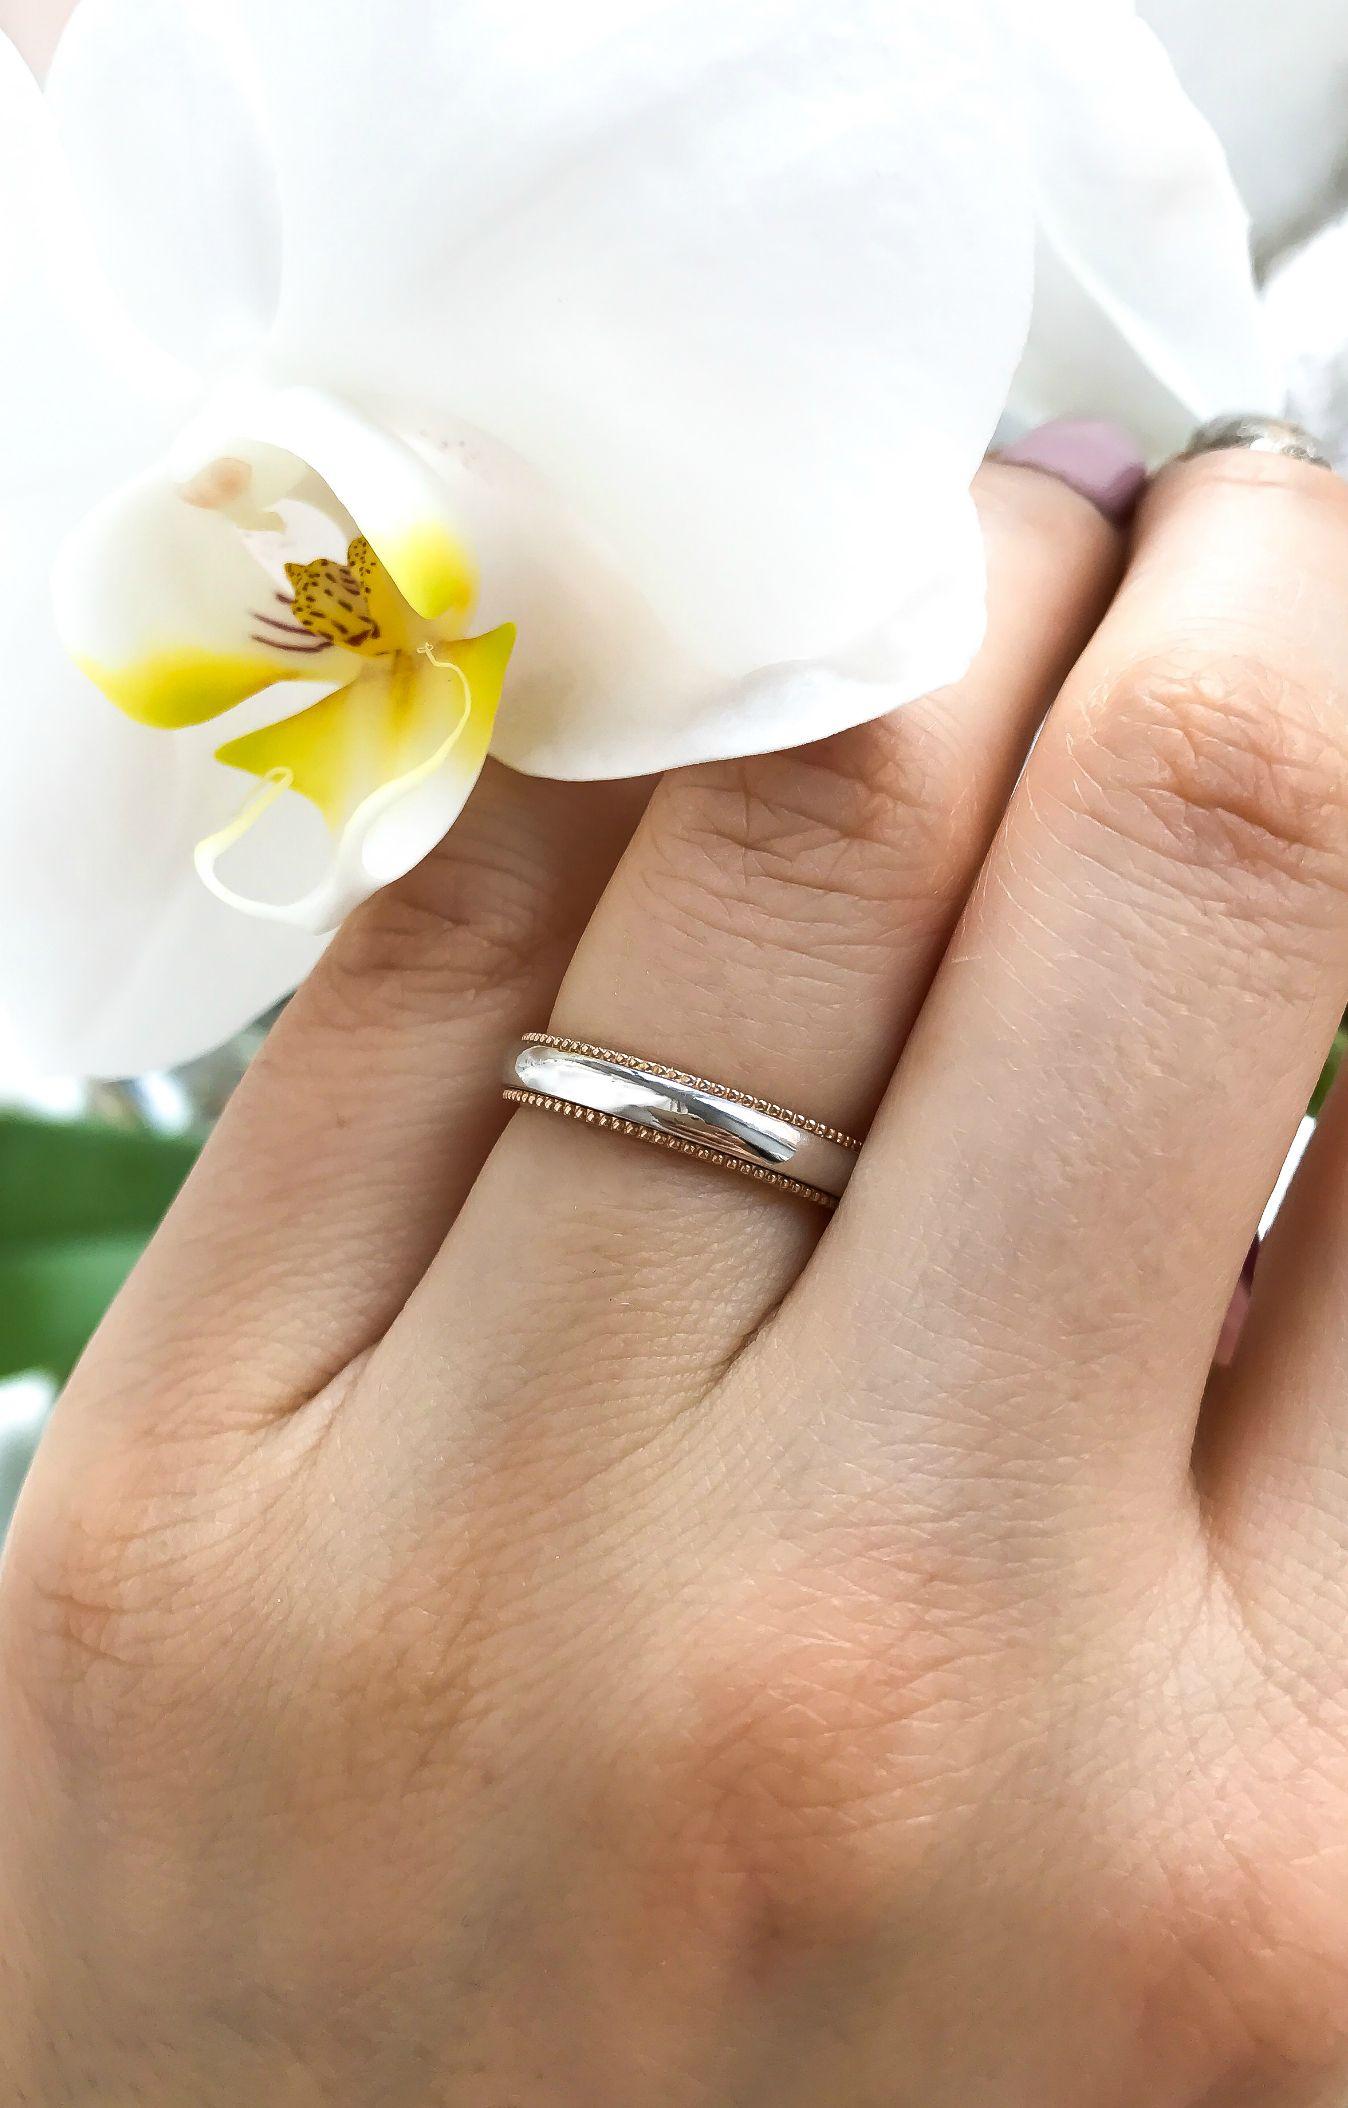 14k Gold Milgrain Wedding Bands Gold Wedding Bands Gold Etsy In 2020 Milgrain Wedding Bands Wedding Ring Bands Trendy Engagement Rings